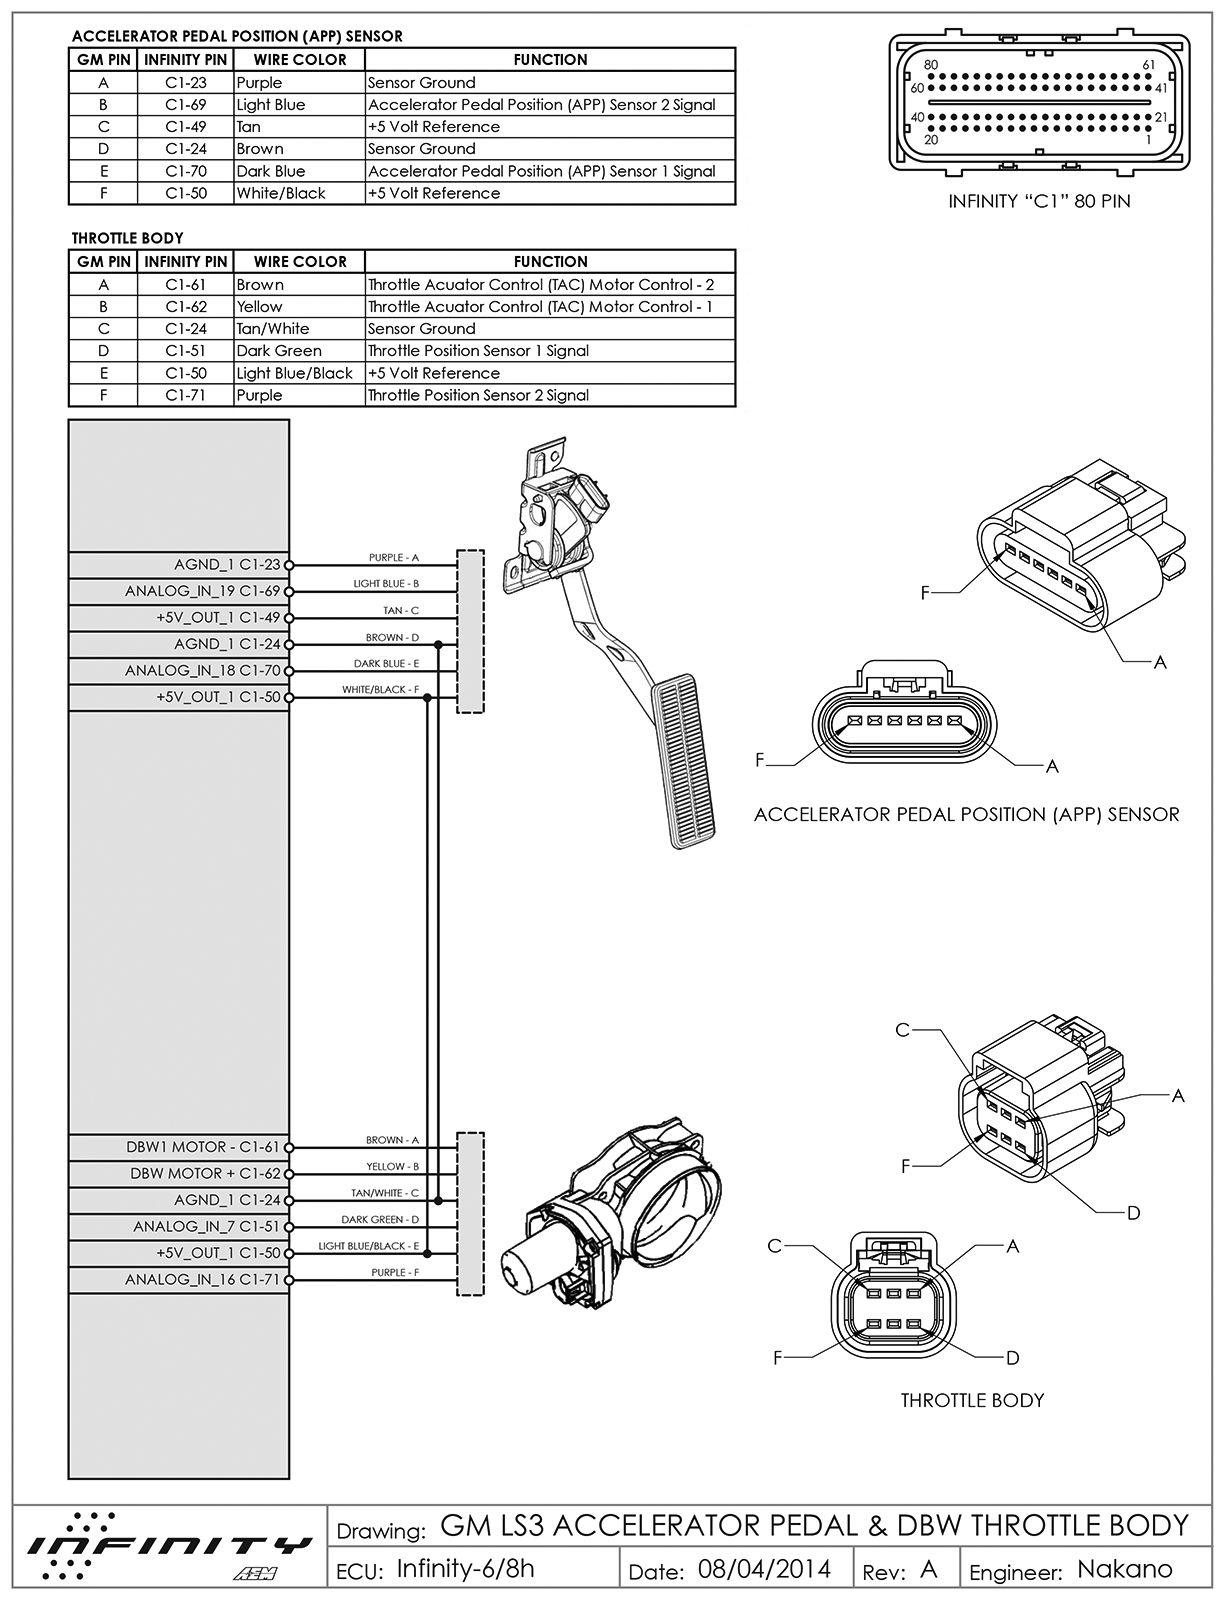 [DIAGRAM_0HG]  GB_6389] Ls3 Throttle Body Wiring Diagram Get Free Image About Wiring  Diagram Wiring Diagram | Chevy Throttle Body Wiring Diagram |  | Atolo Tobiq Wigeg Mohammedshrine Librar Wiring 101